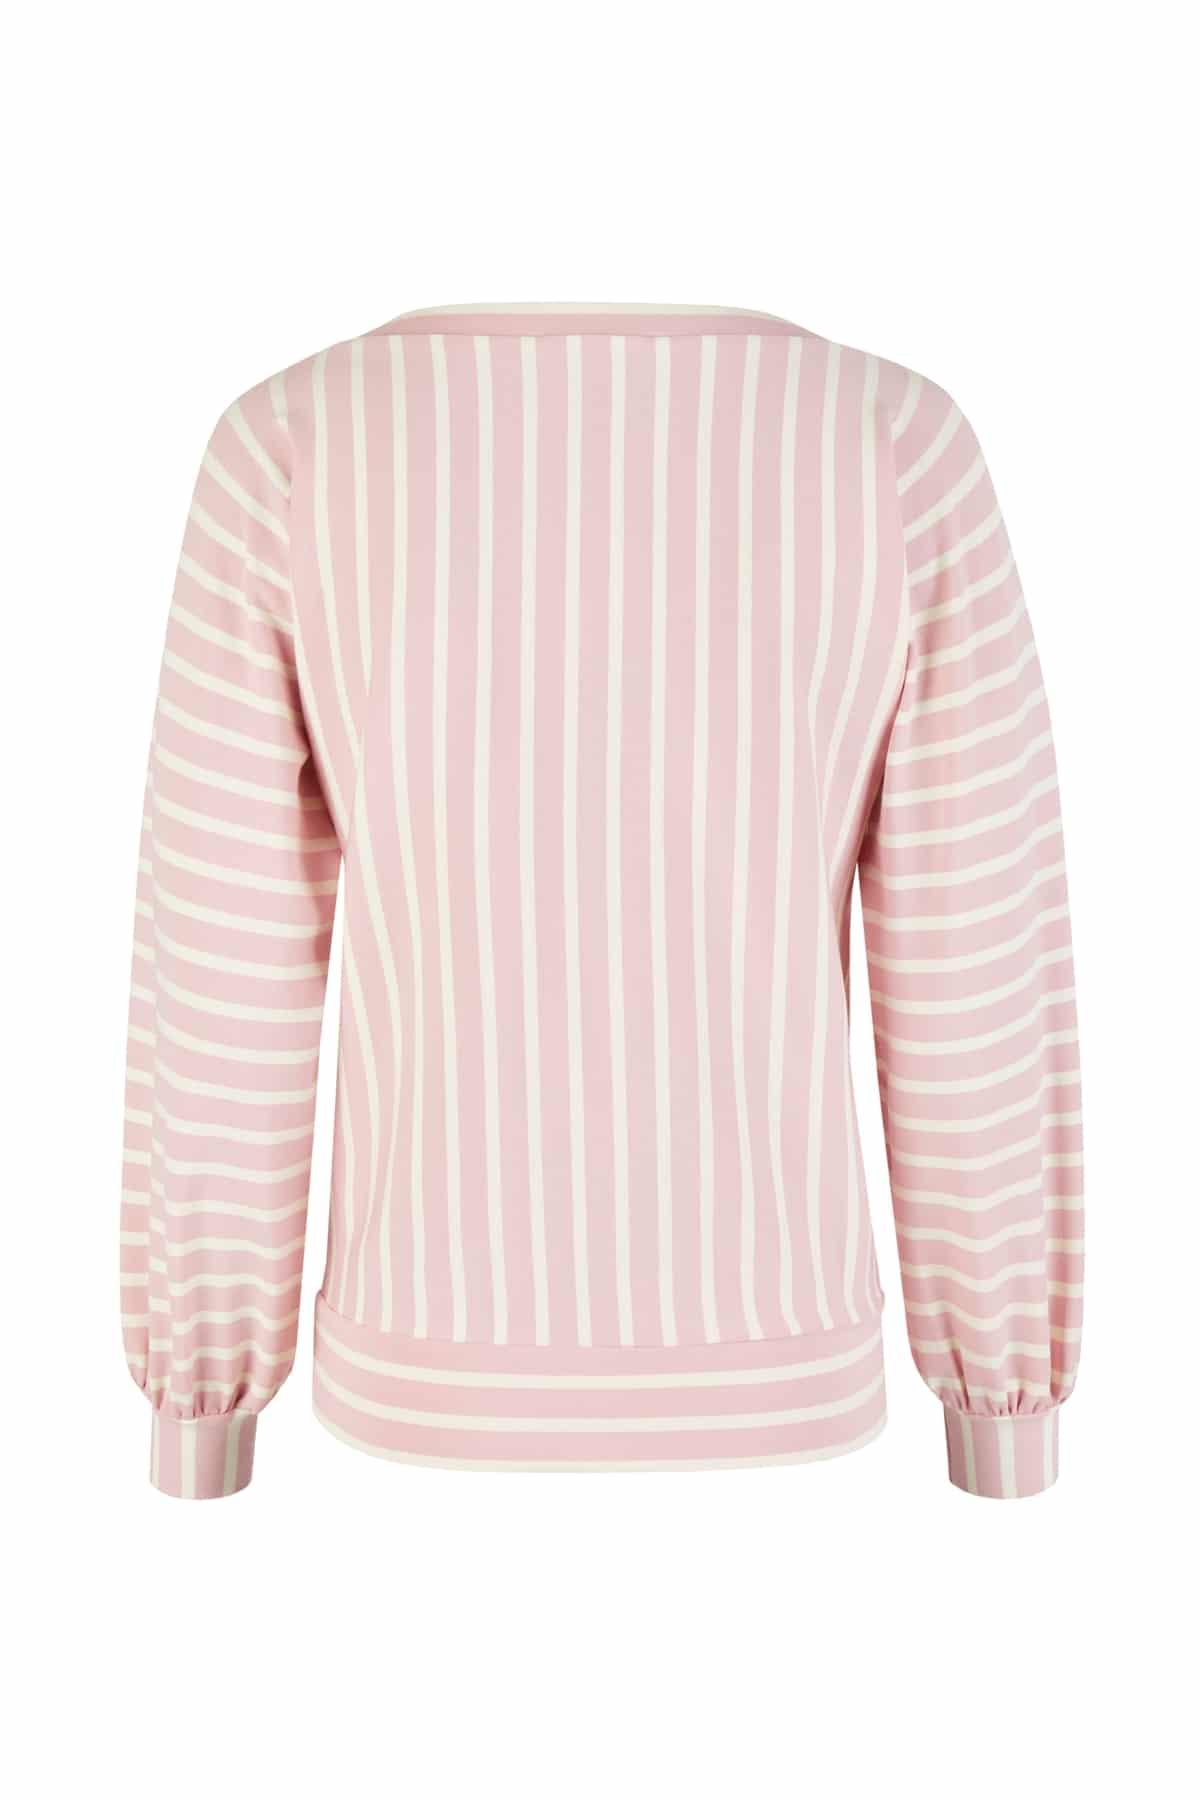 sweatshirt streifen rosa back